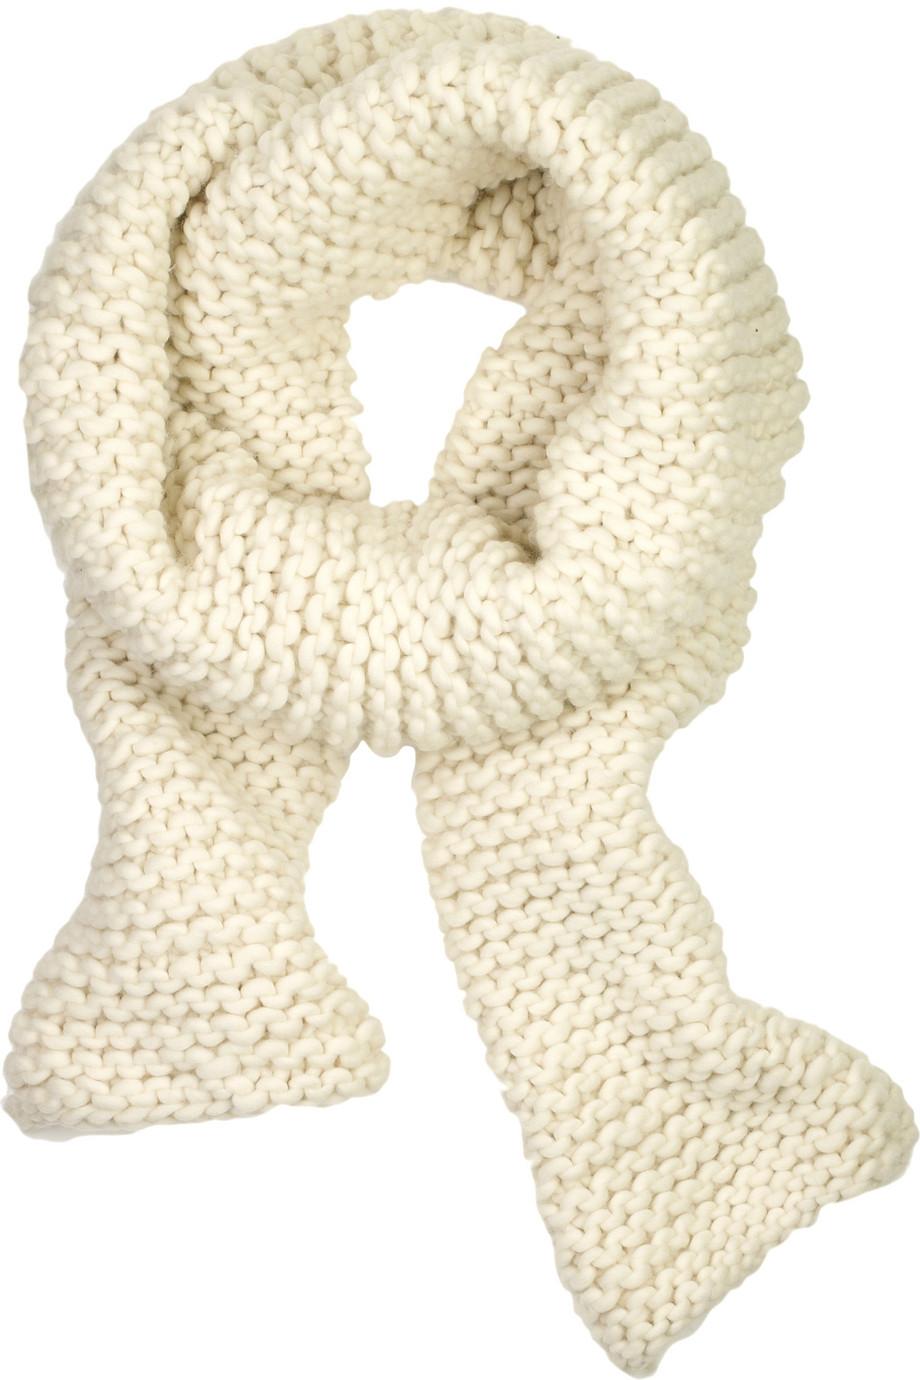 wool-scarf. Best 10 Ideas for Choosing Winter Gifts